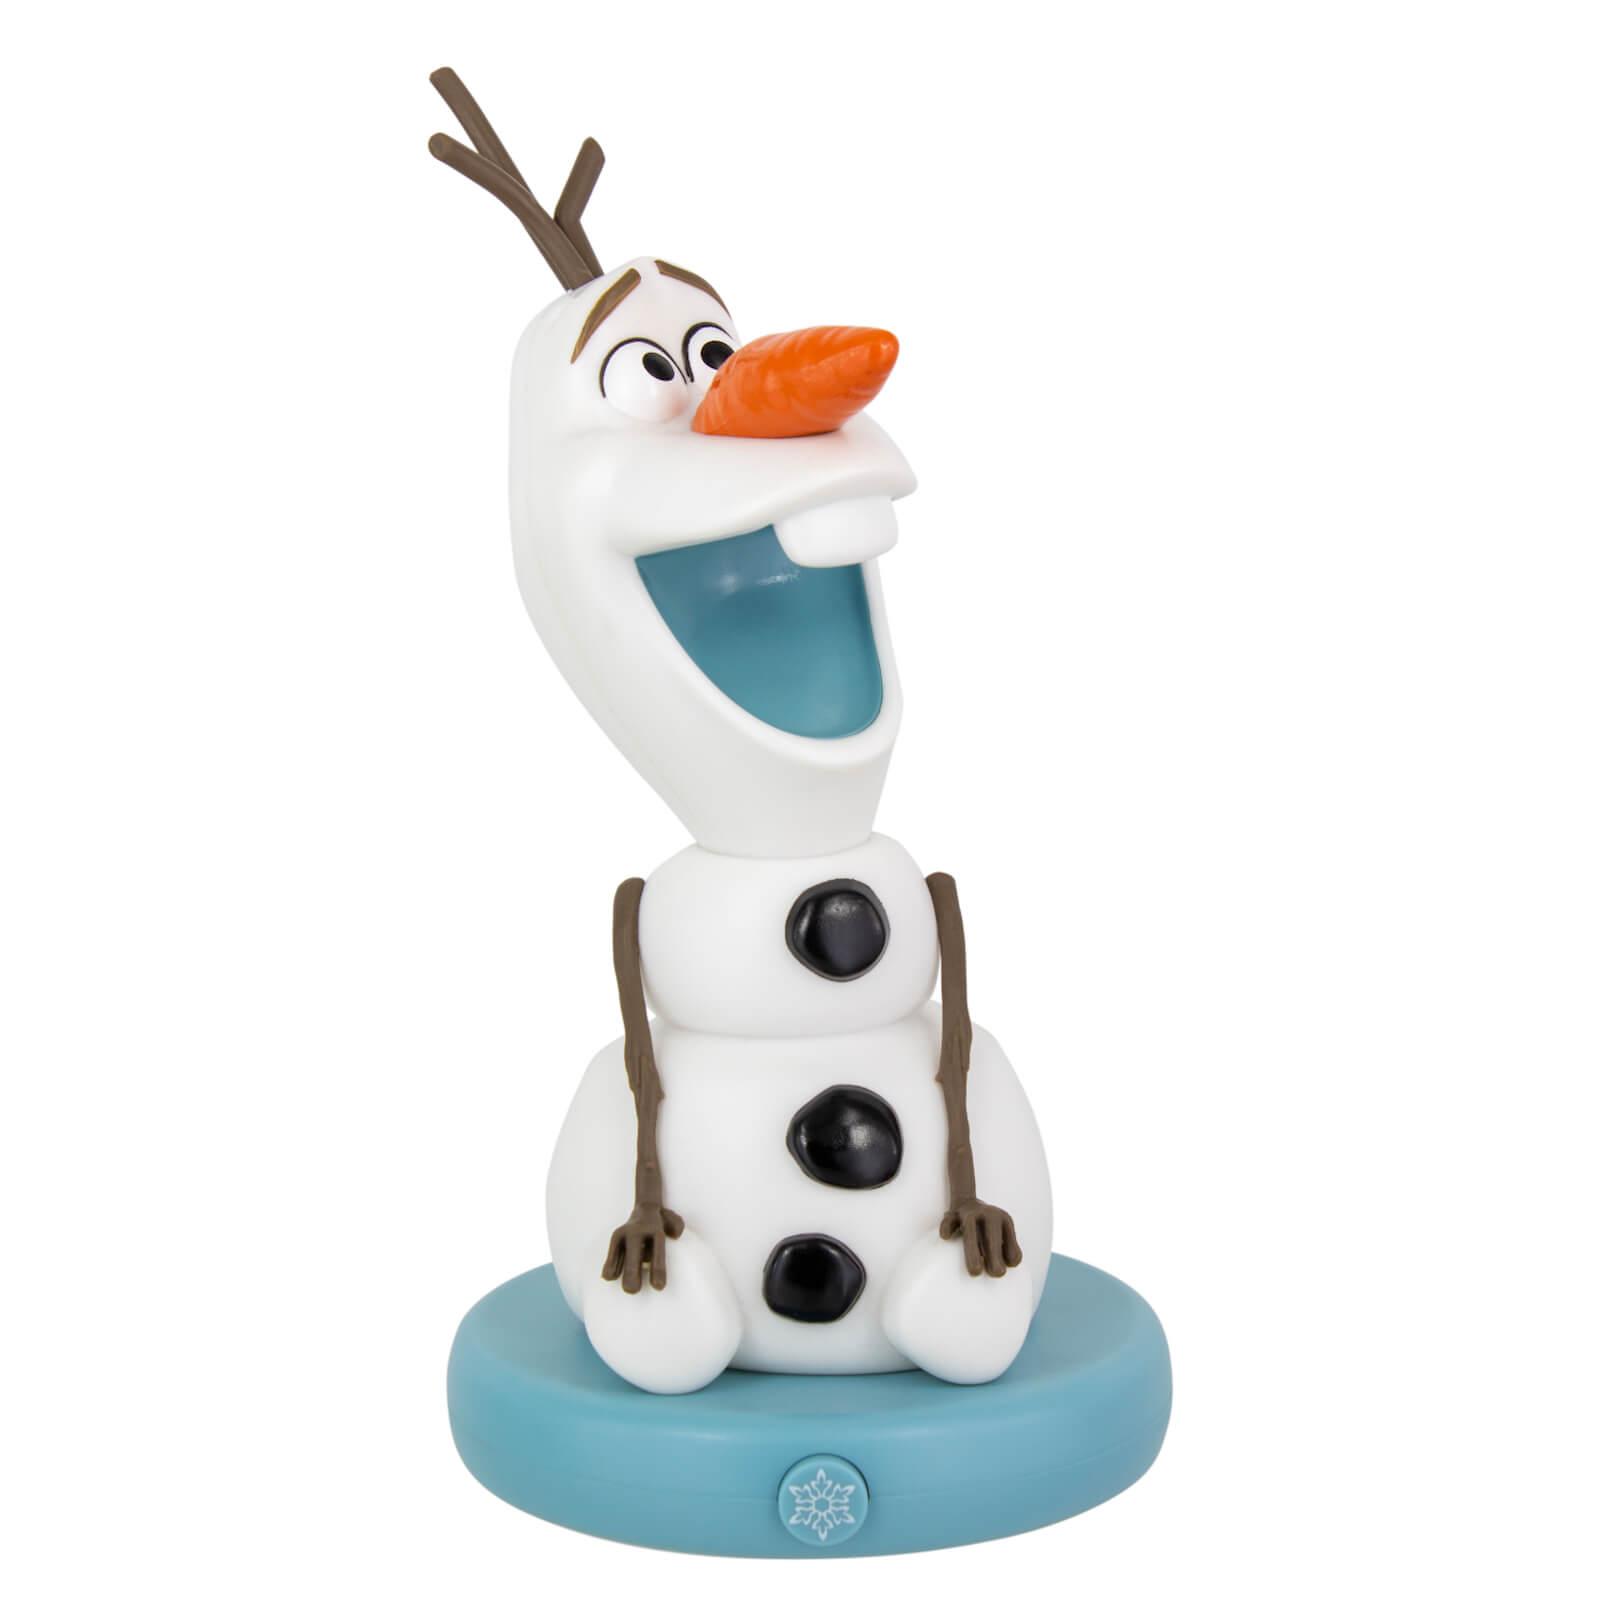 Image of Disney Frozen Olaf Light